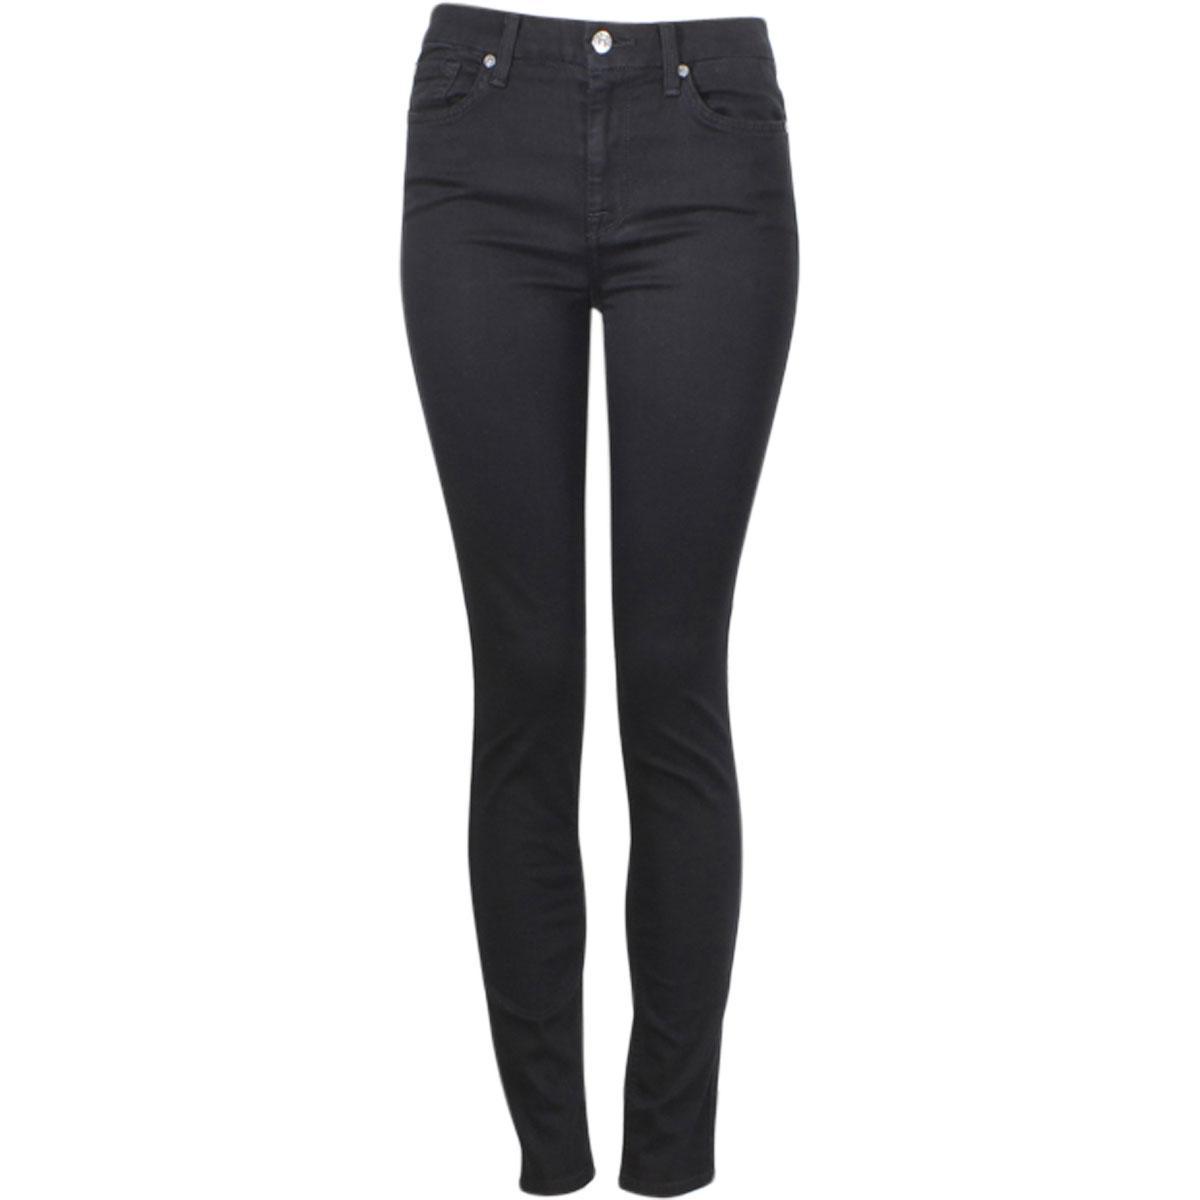 Image of 7 For All Mankind Women's (B)Air Denim The High Waist Skinny Full Length Jeans - Black - 24 (00)